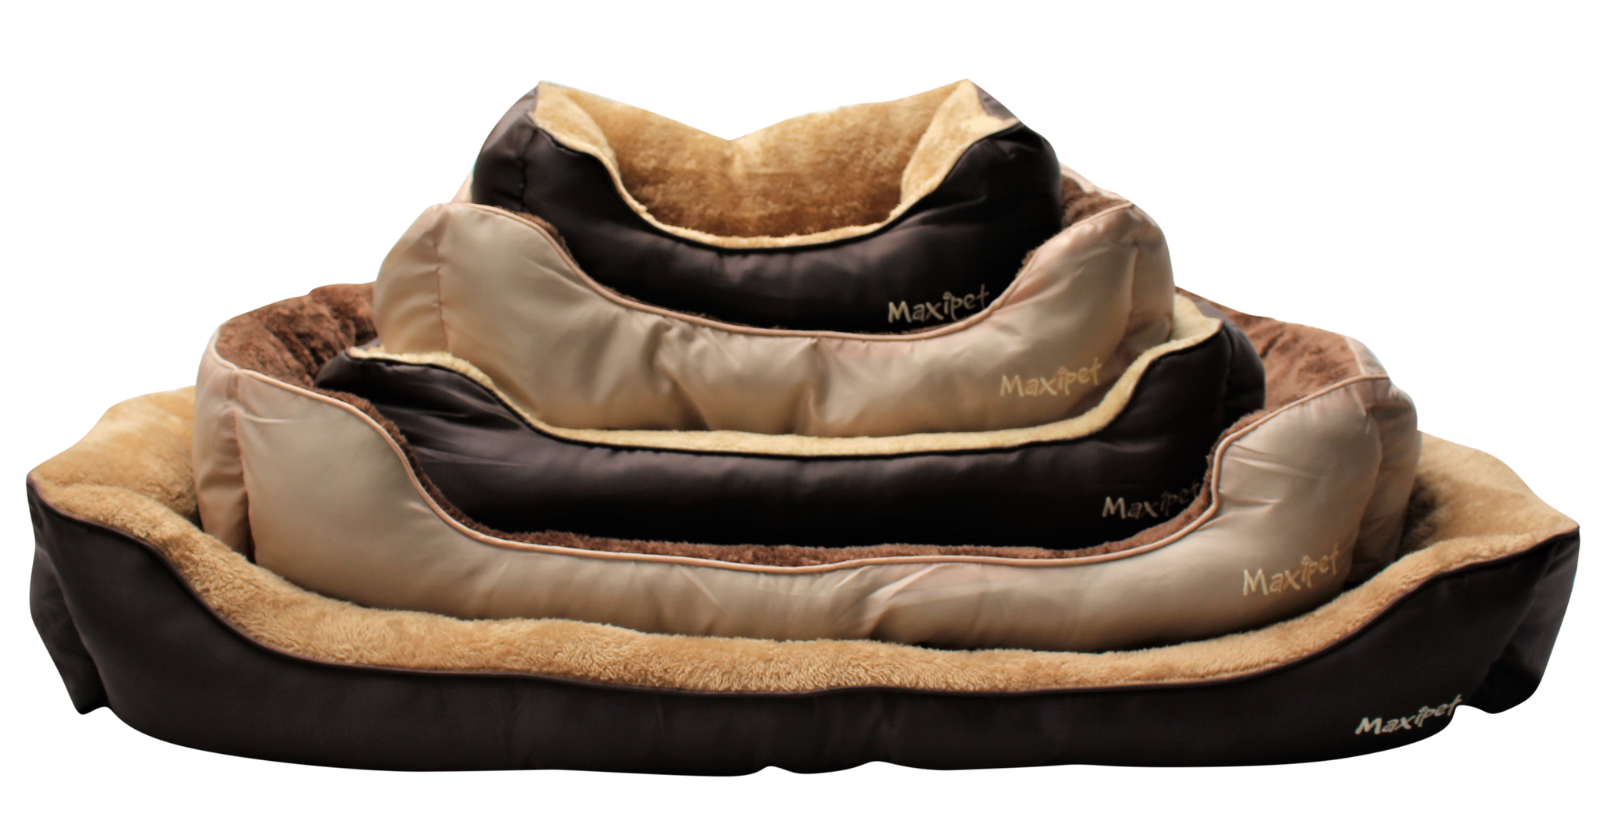 MaxiPet Deluxe Soft Washable Dog Pet Warm Basket Bed Cushion with Fleece Lining Large Beige